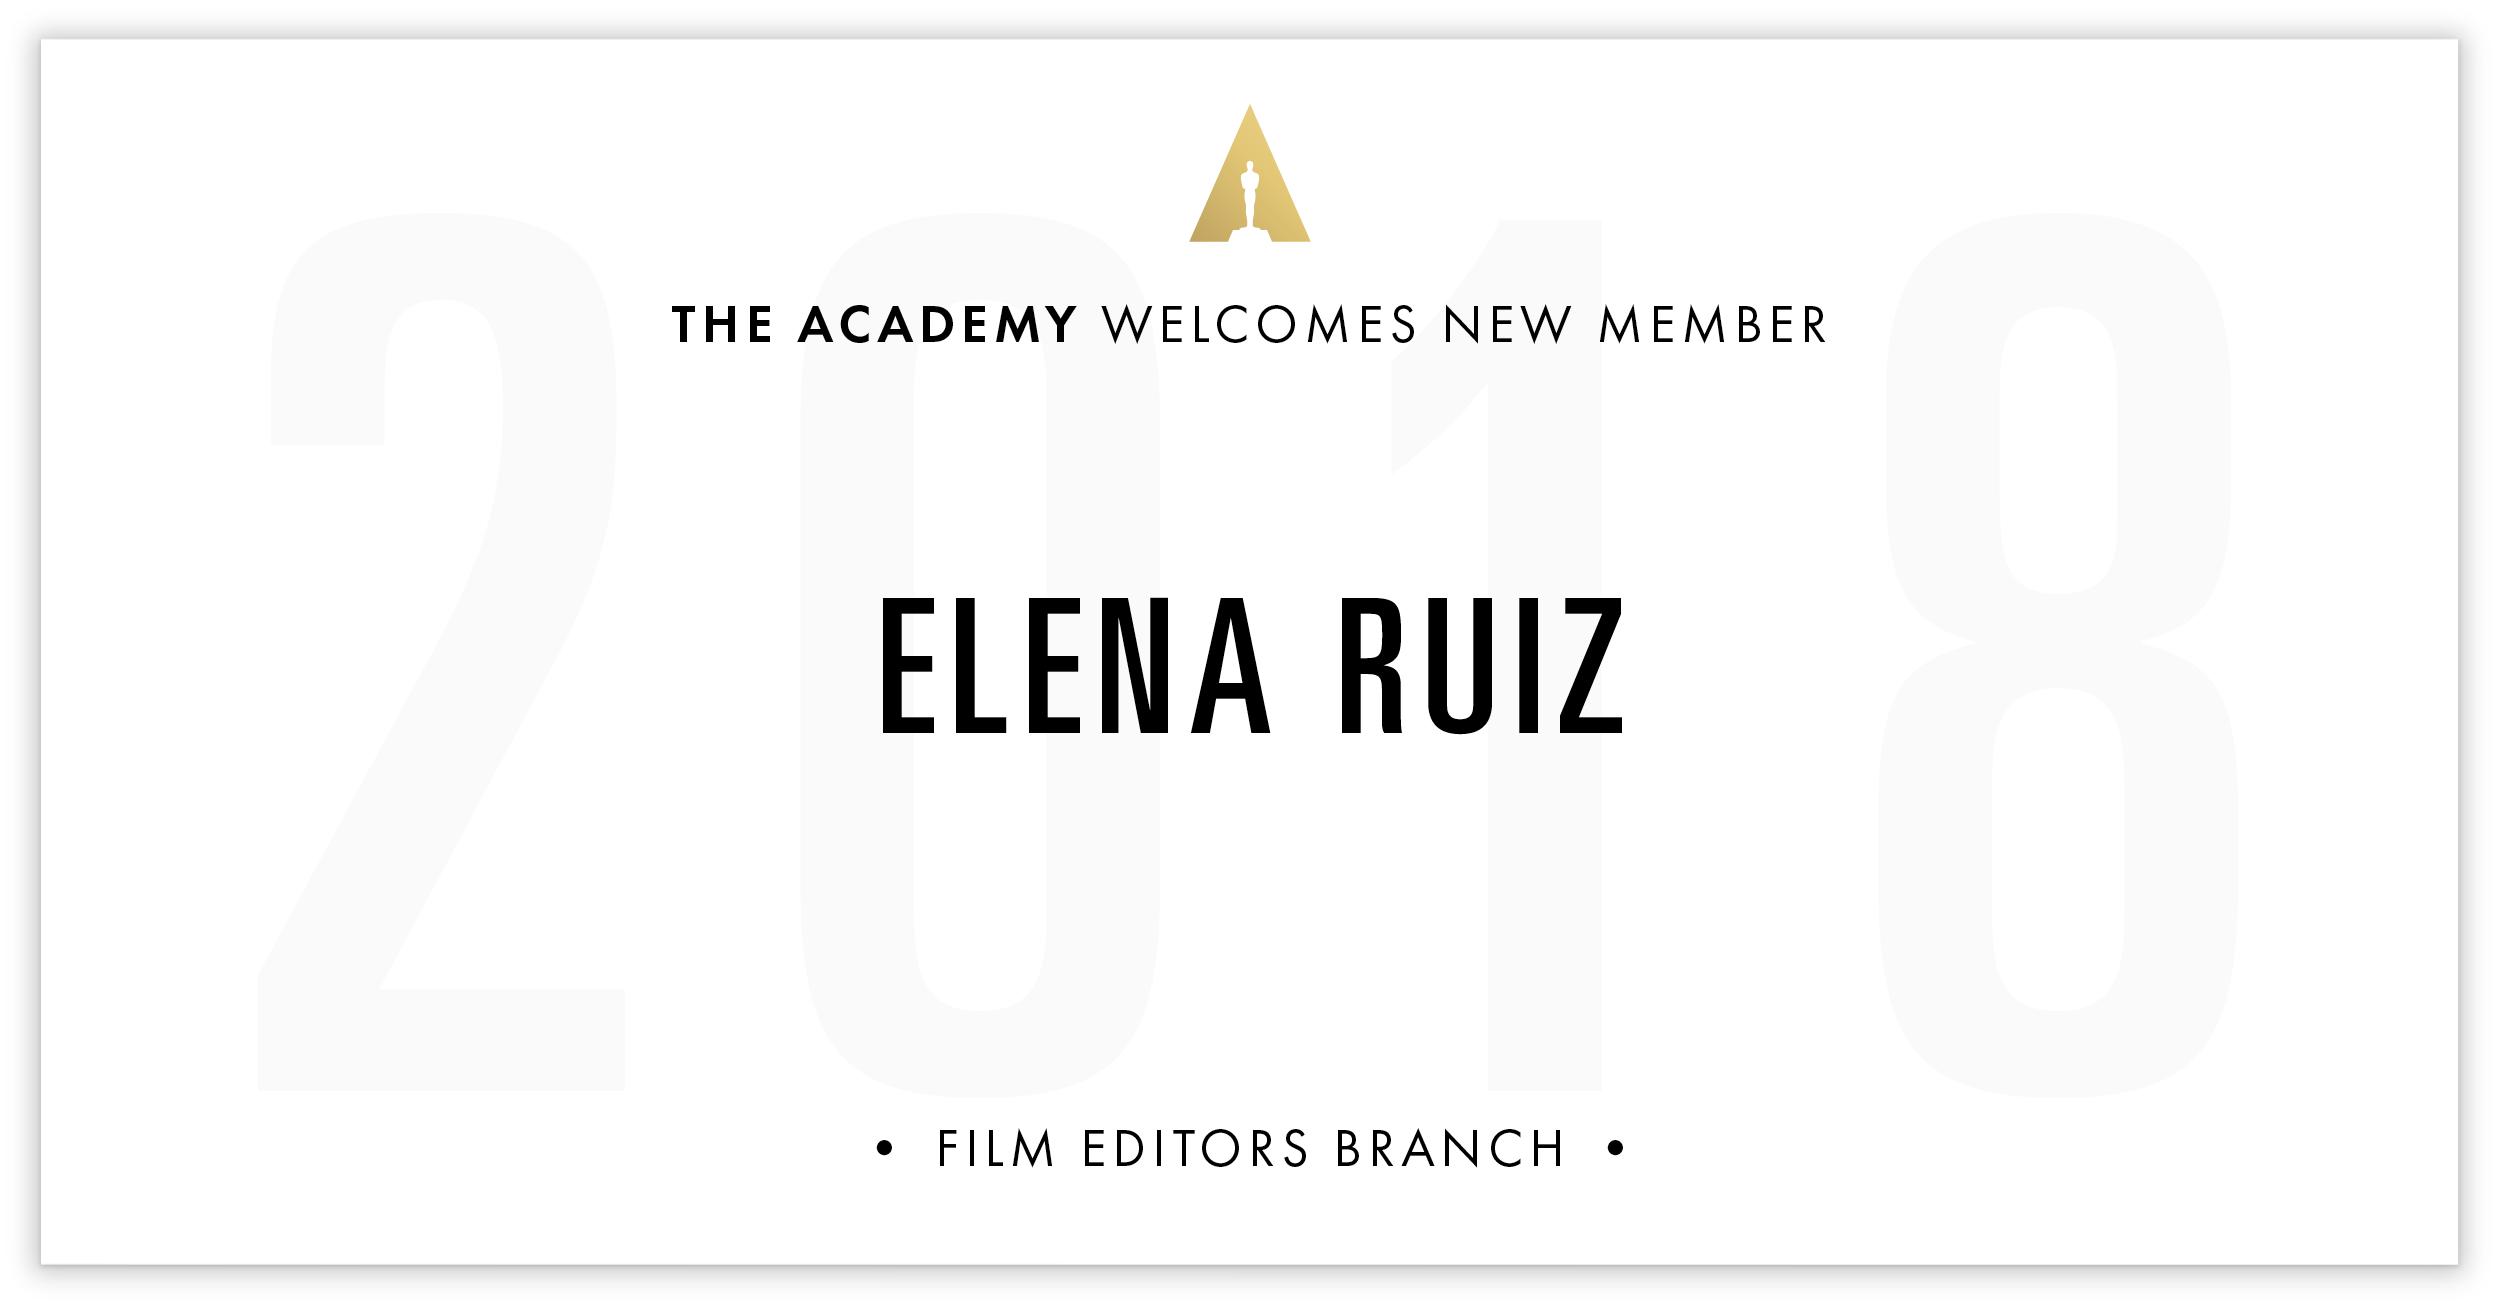 Elena Ruiz is invited!